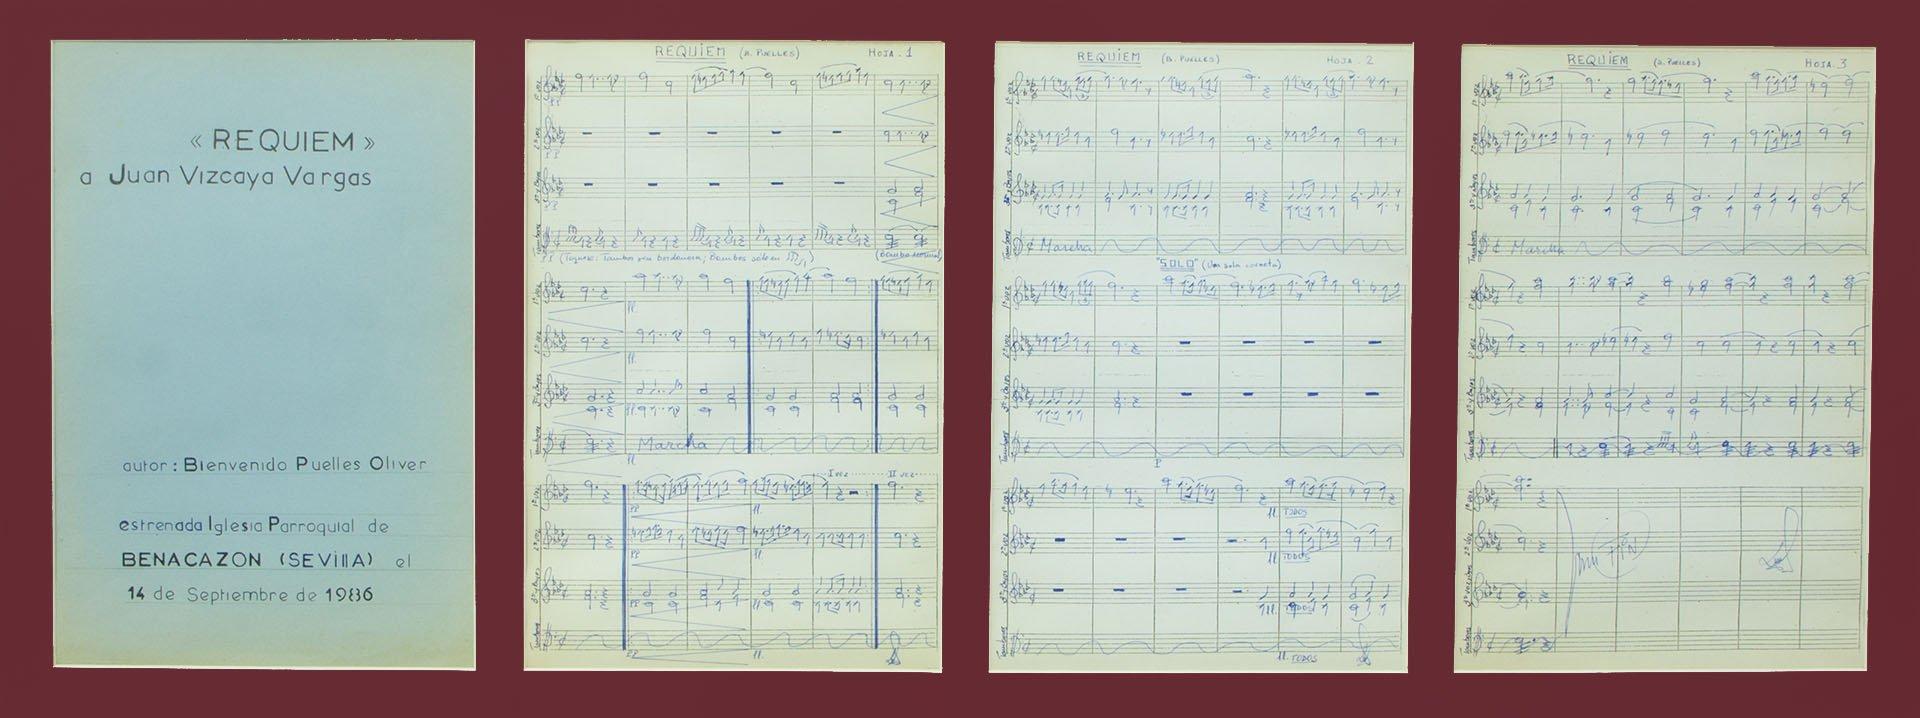 Partituras originales de Réquiem